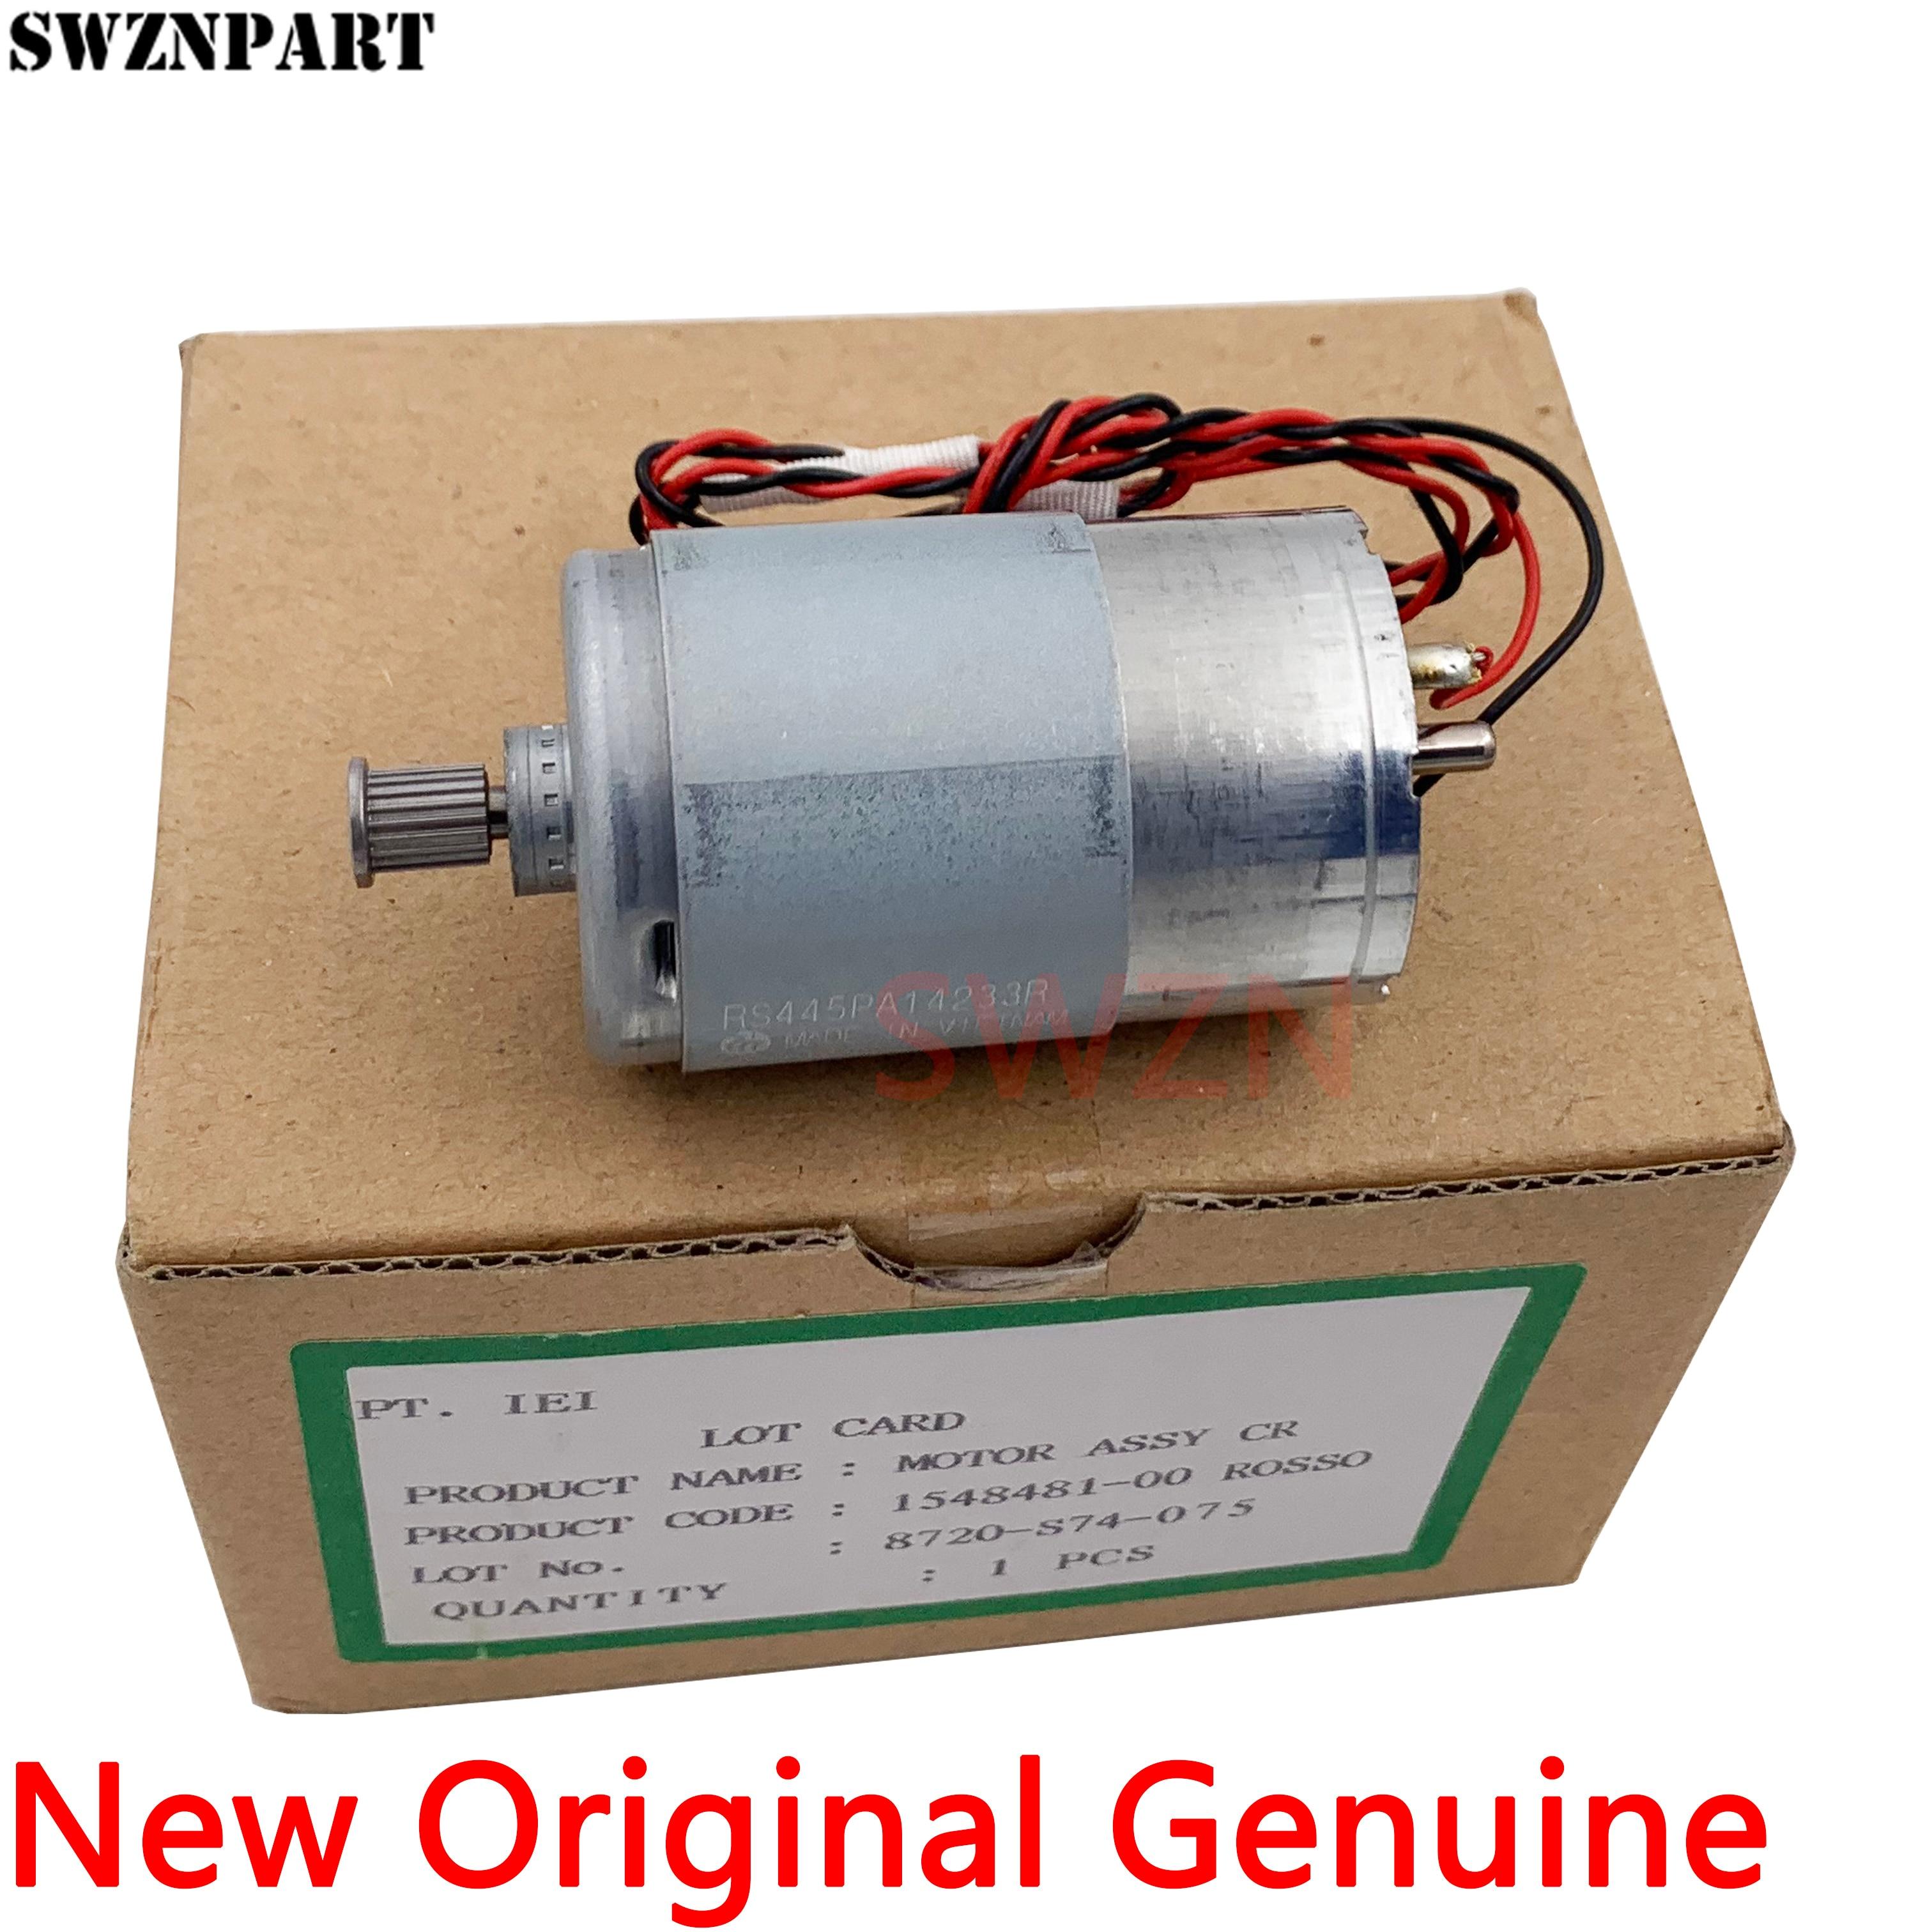 Novo CR motor do Carro de Motor Do Motor Para Epson M101 M201 M105 M205 L605 L655 L1455 L600 L606 L650 L656